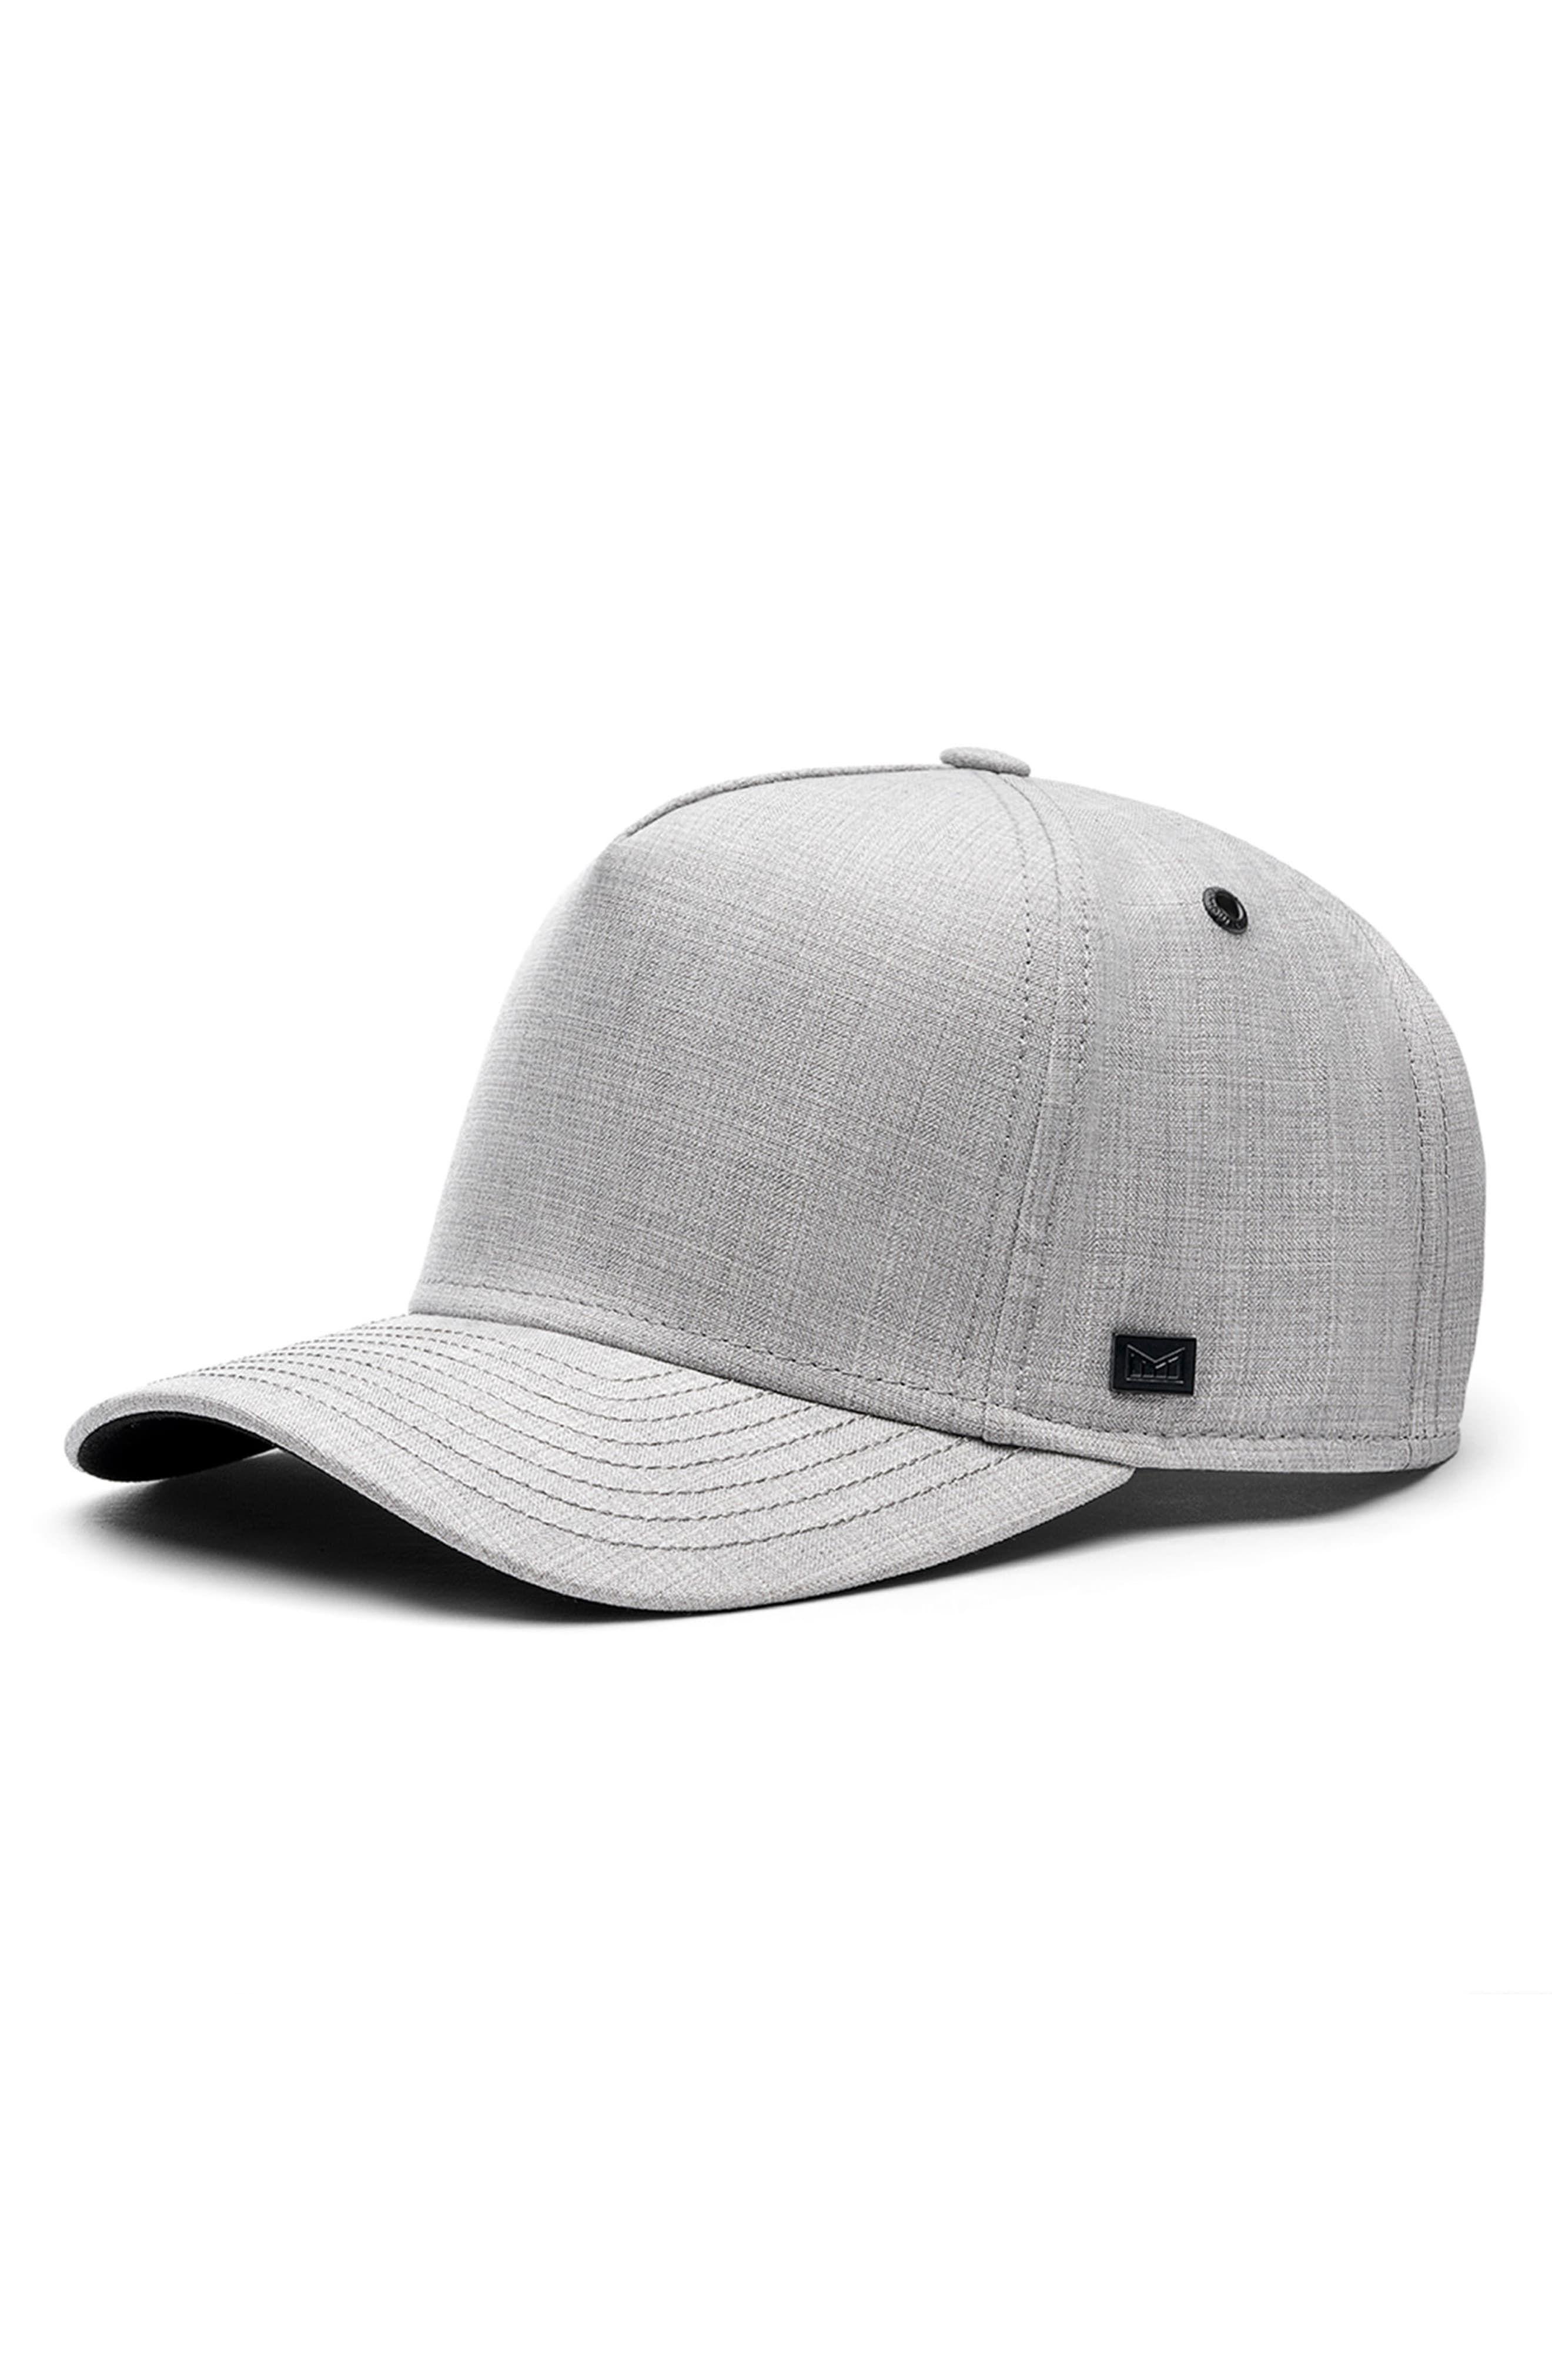 on sale f3d9b 9e3f9 Men s Melin Odyssey Baseball Cap - Grey